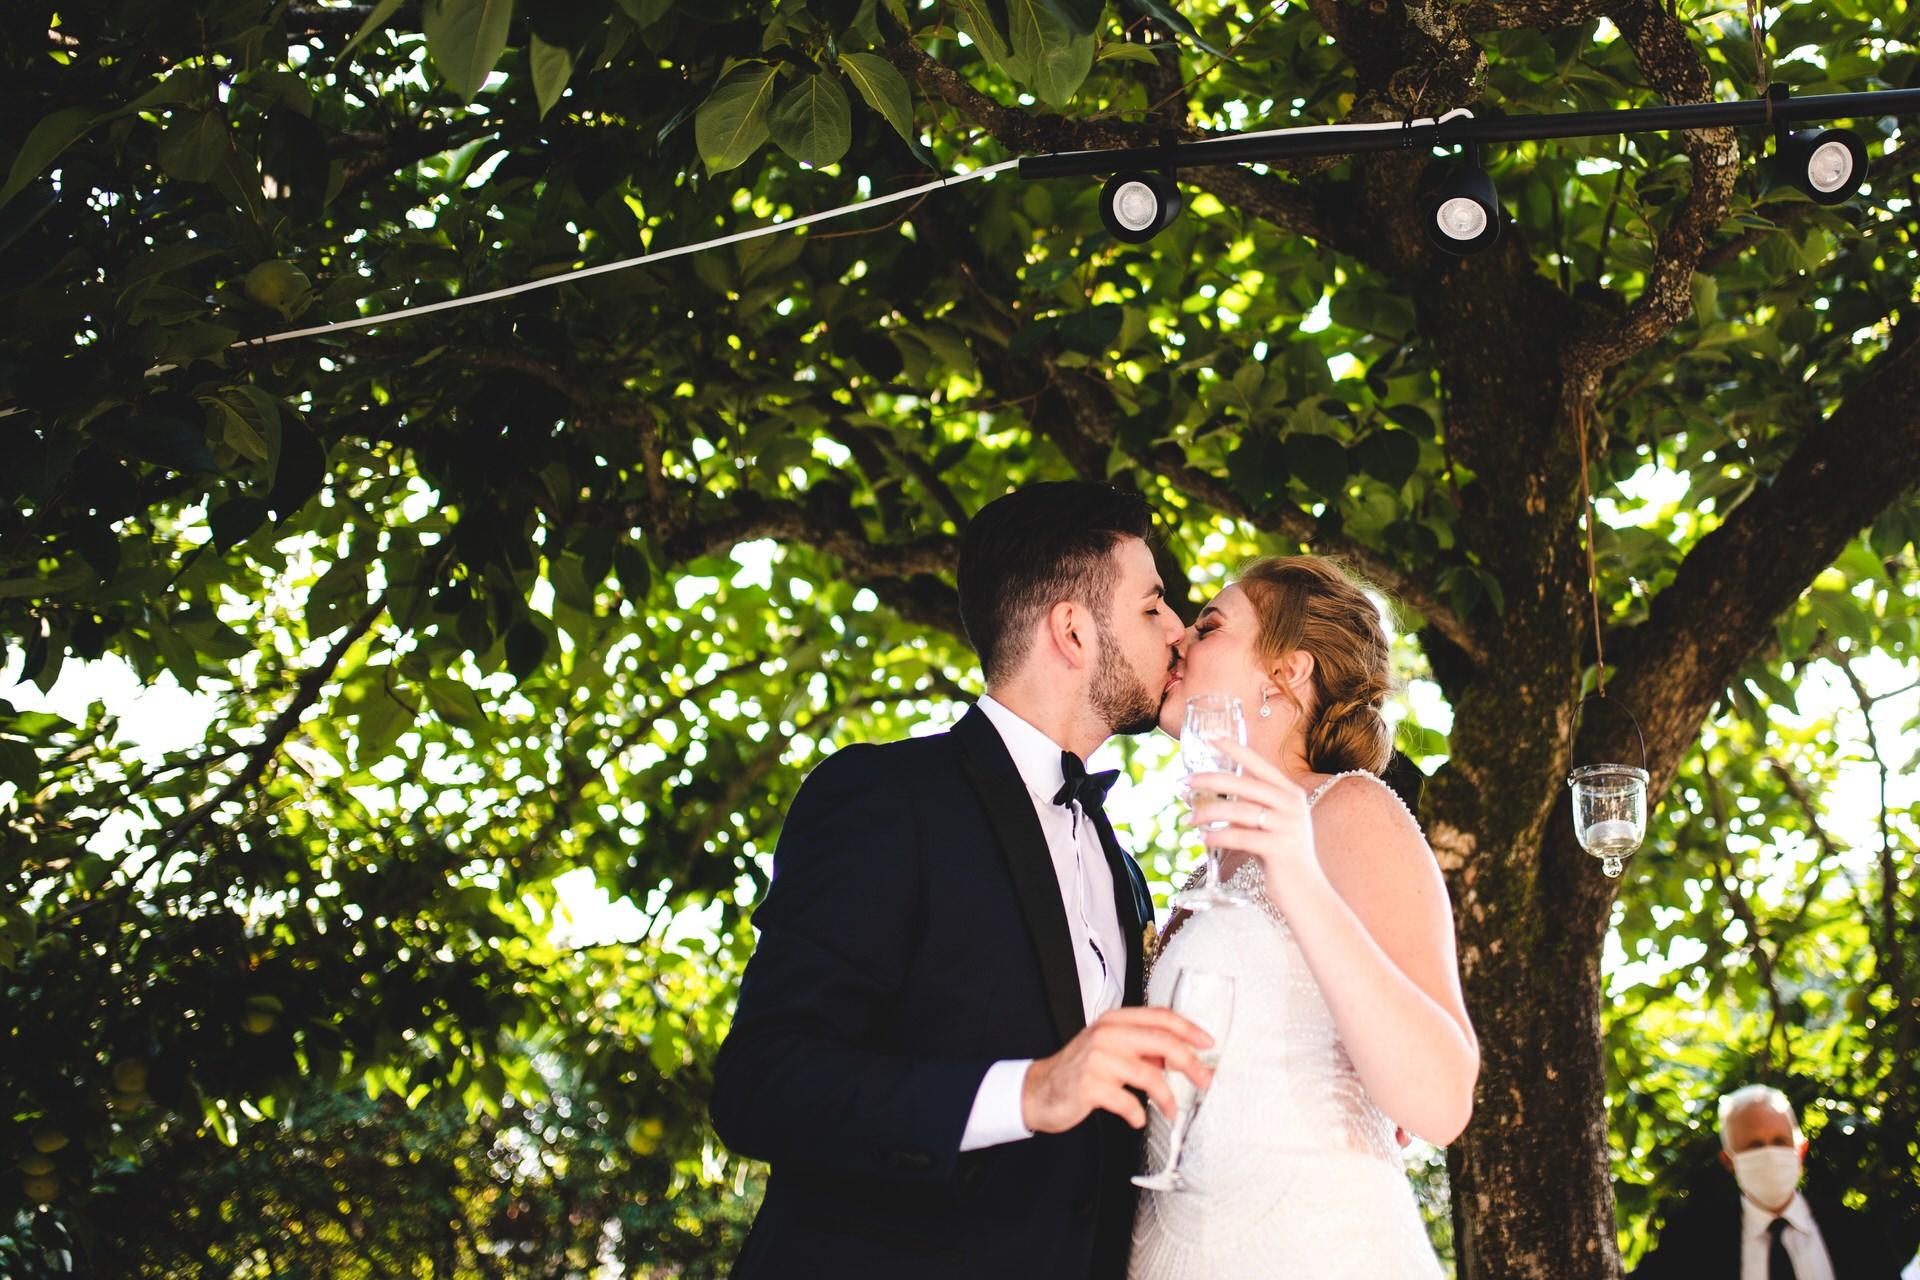 La Limonaia di Villa Senni, Florence IT Wedding Portrait | Taking the celebration outside on a lovely, sunny day